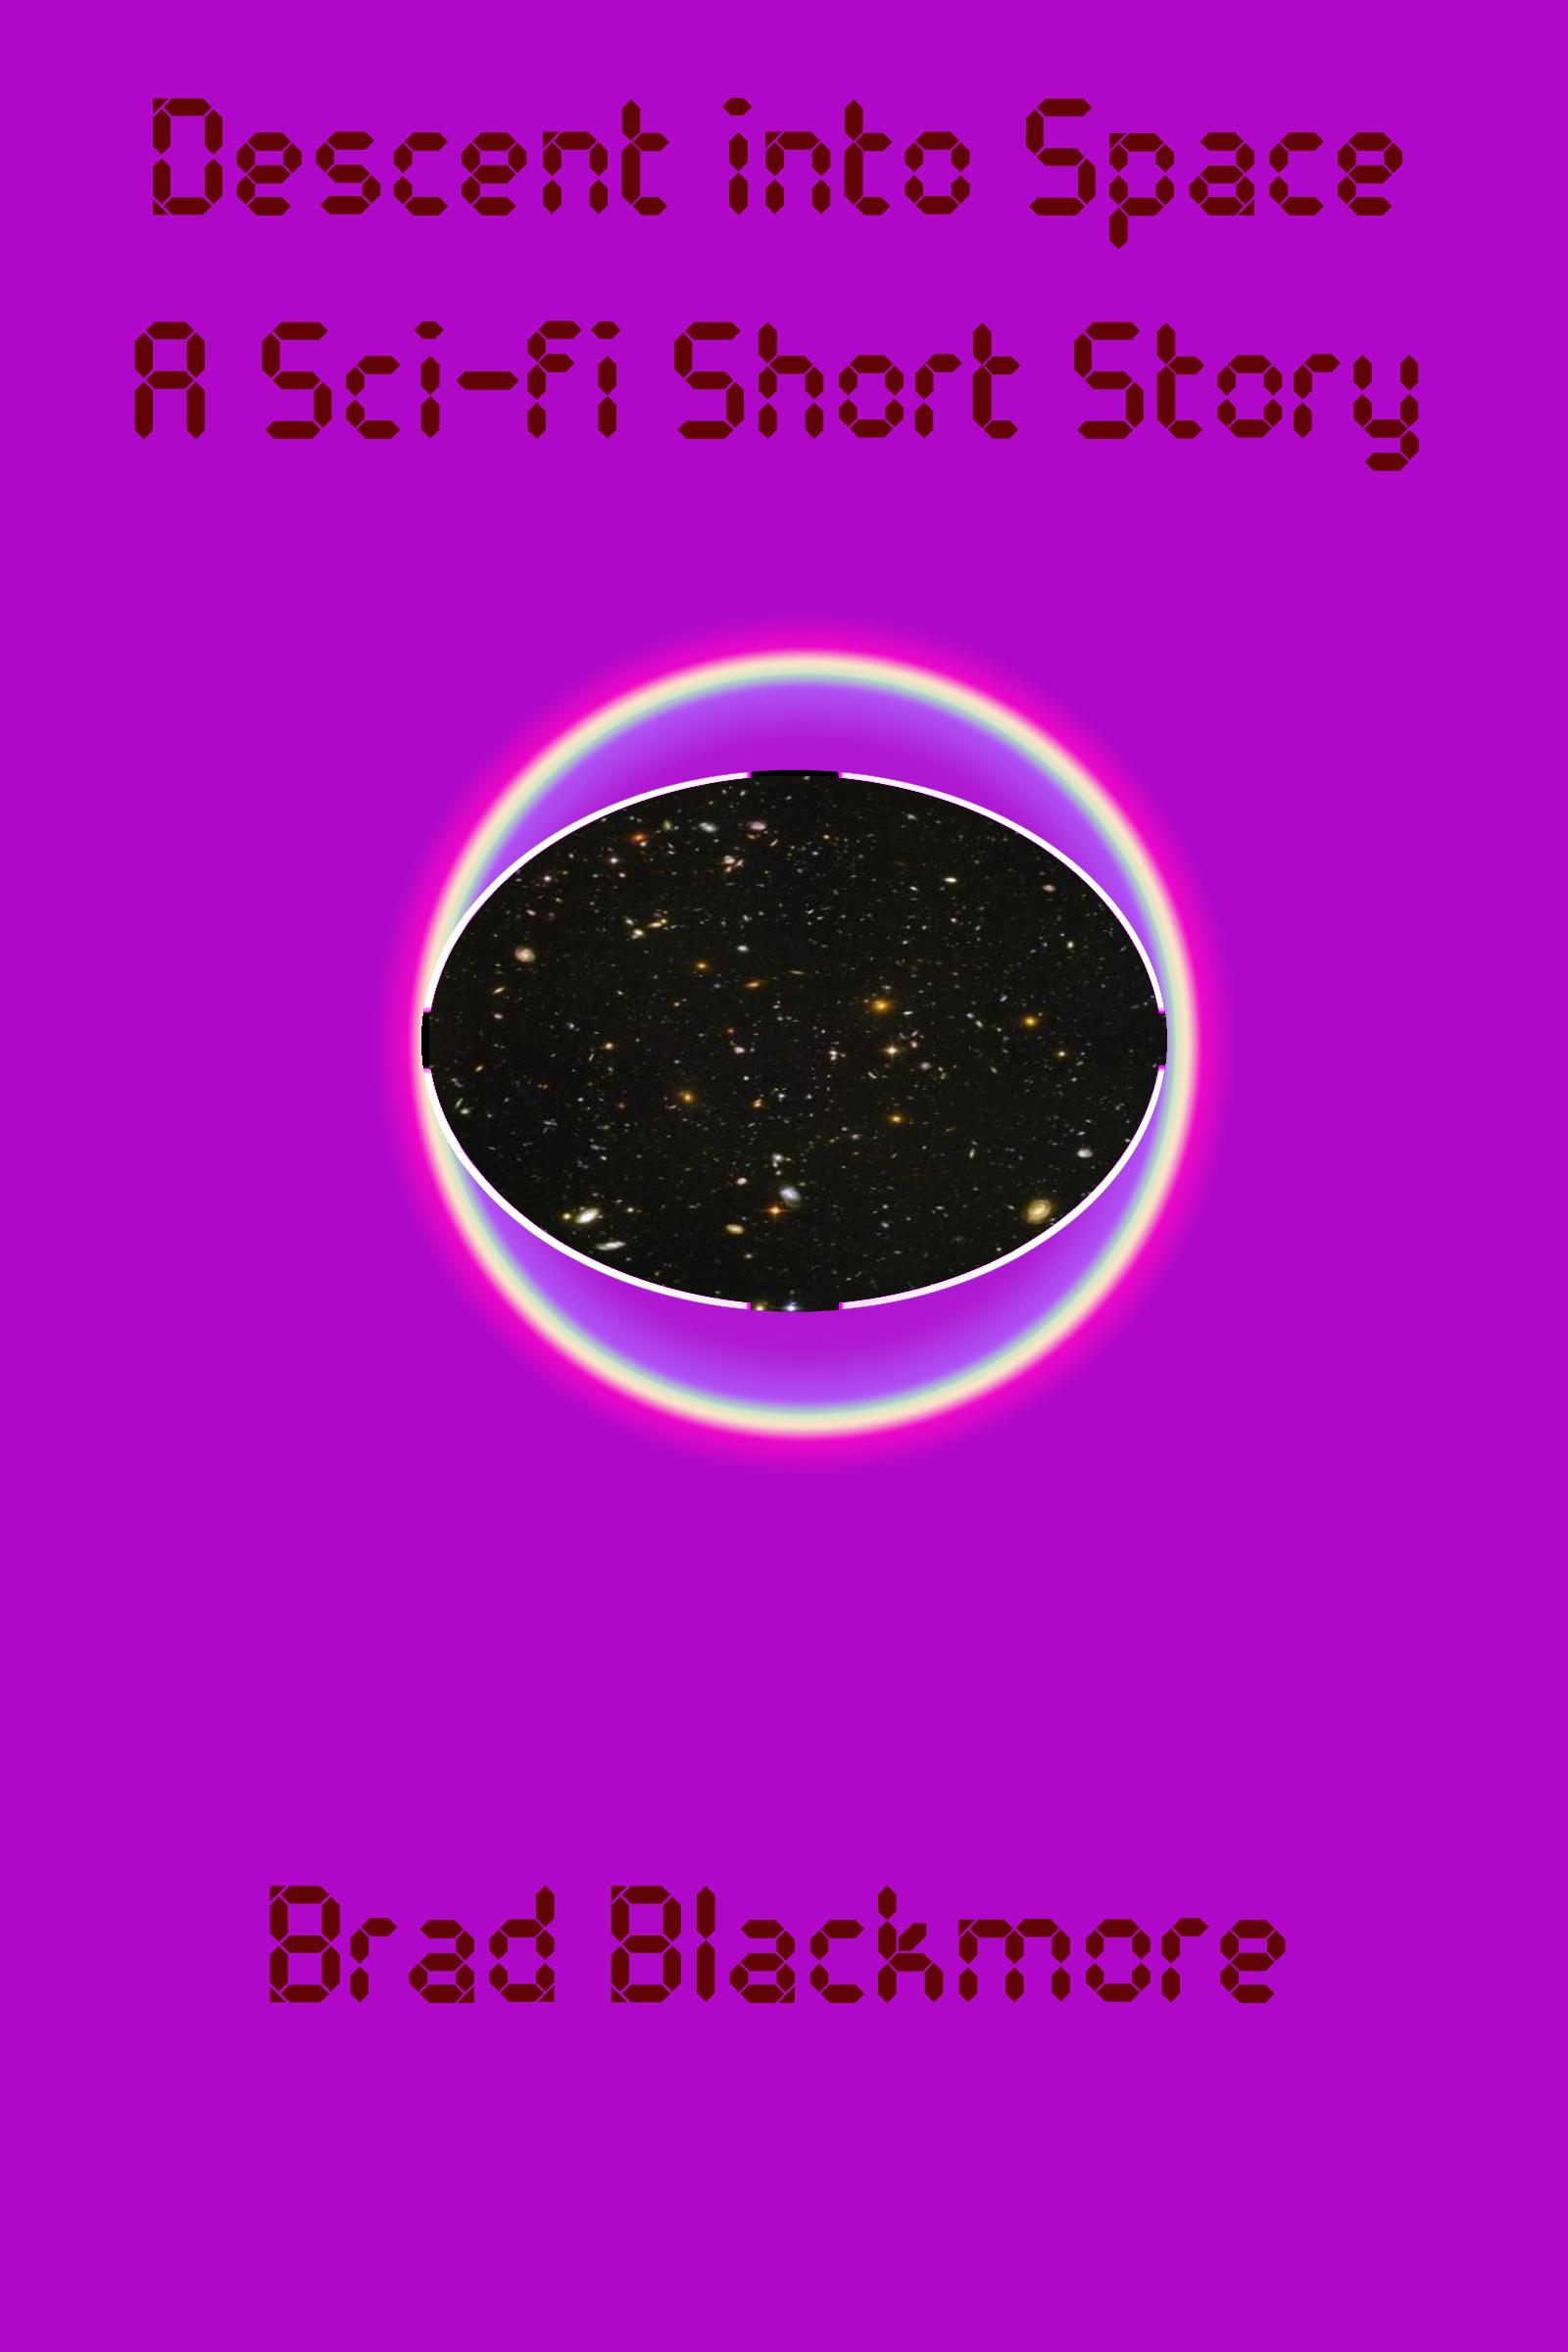 Descent into Space, an Ebook by Brad Blackmore